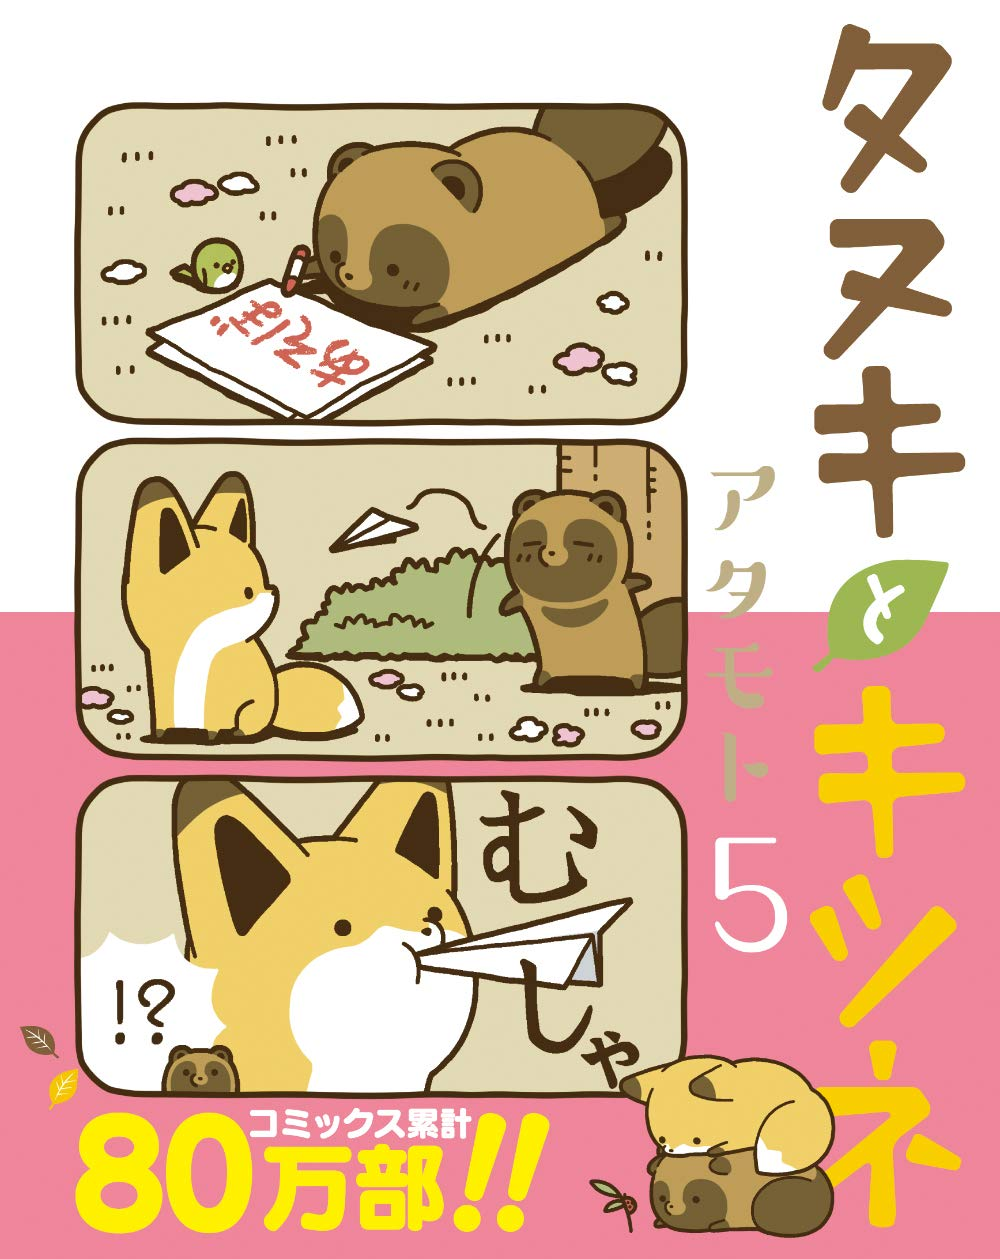 Tanuki to Kitsune 5